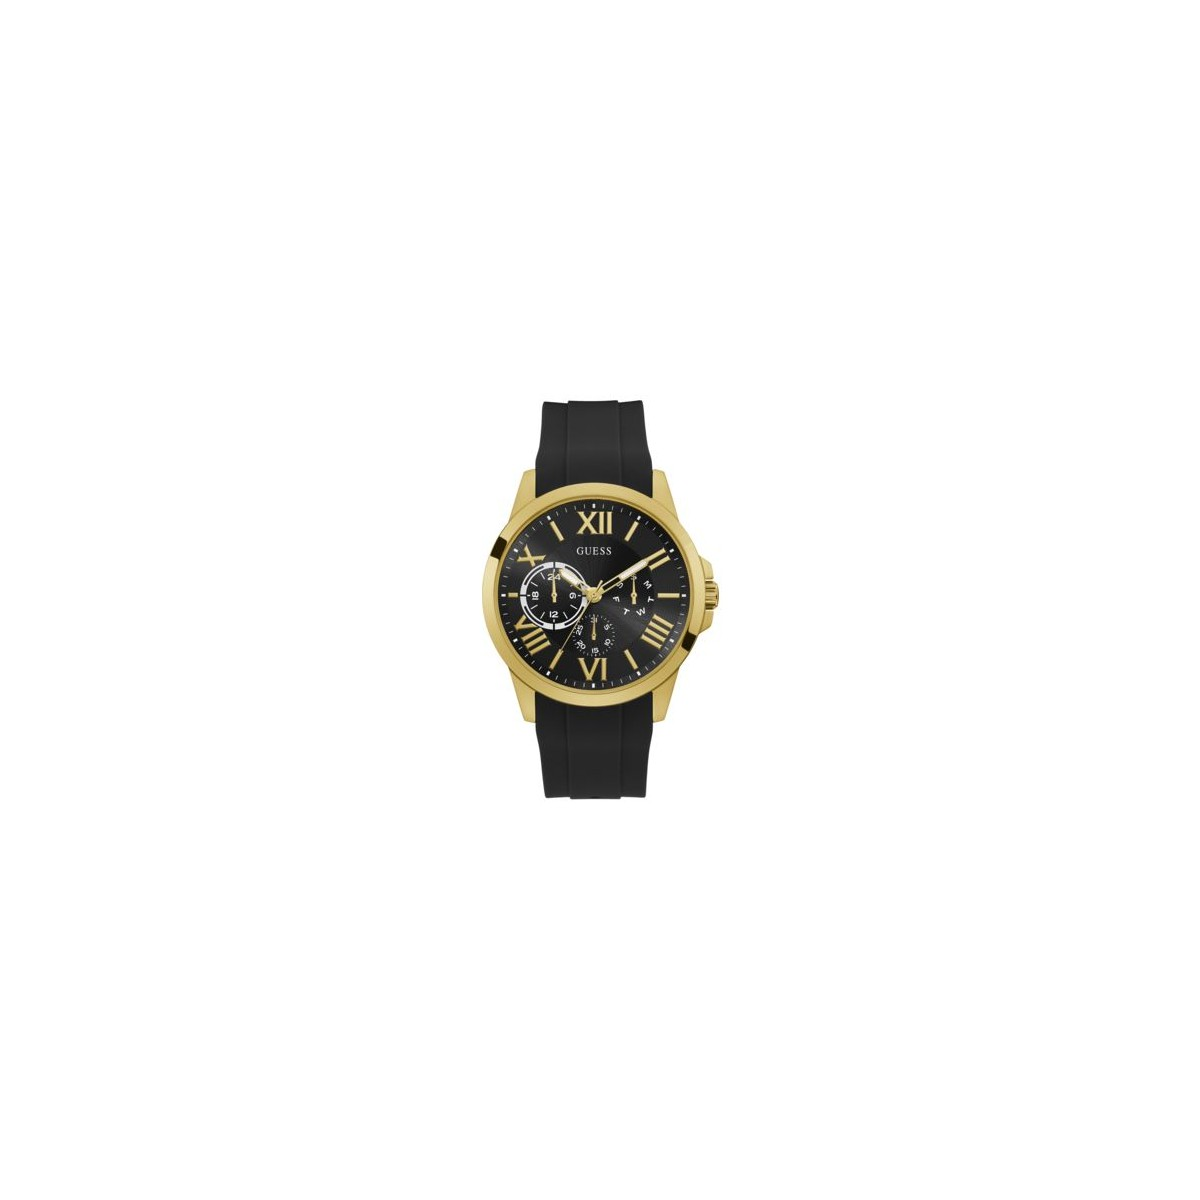 https://www.gaberjoyeria.com/5465-thickbox_default/reloj-guess-orbit.jpg